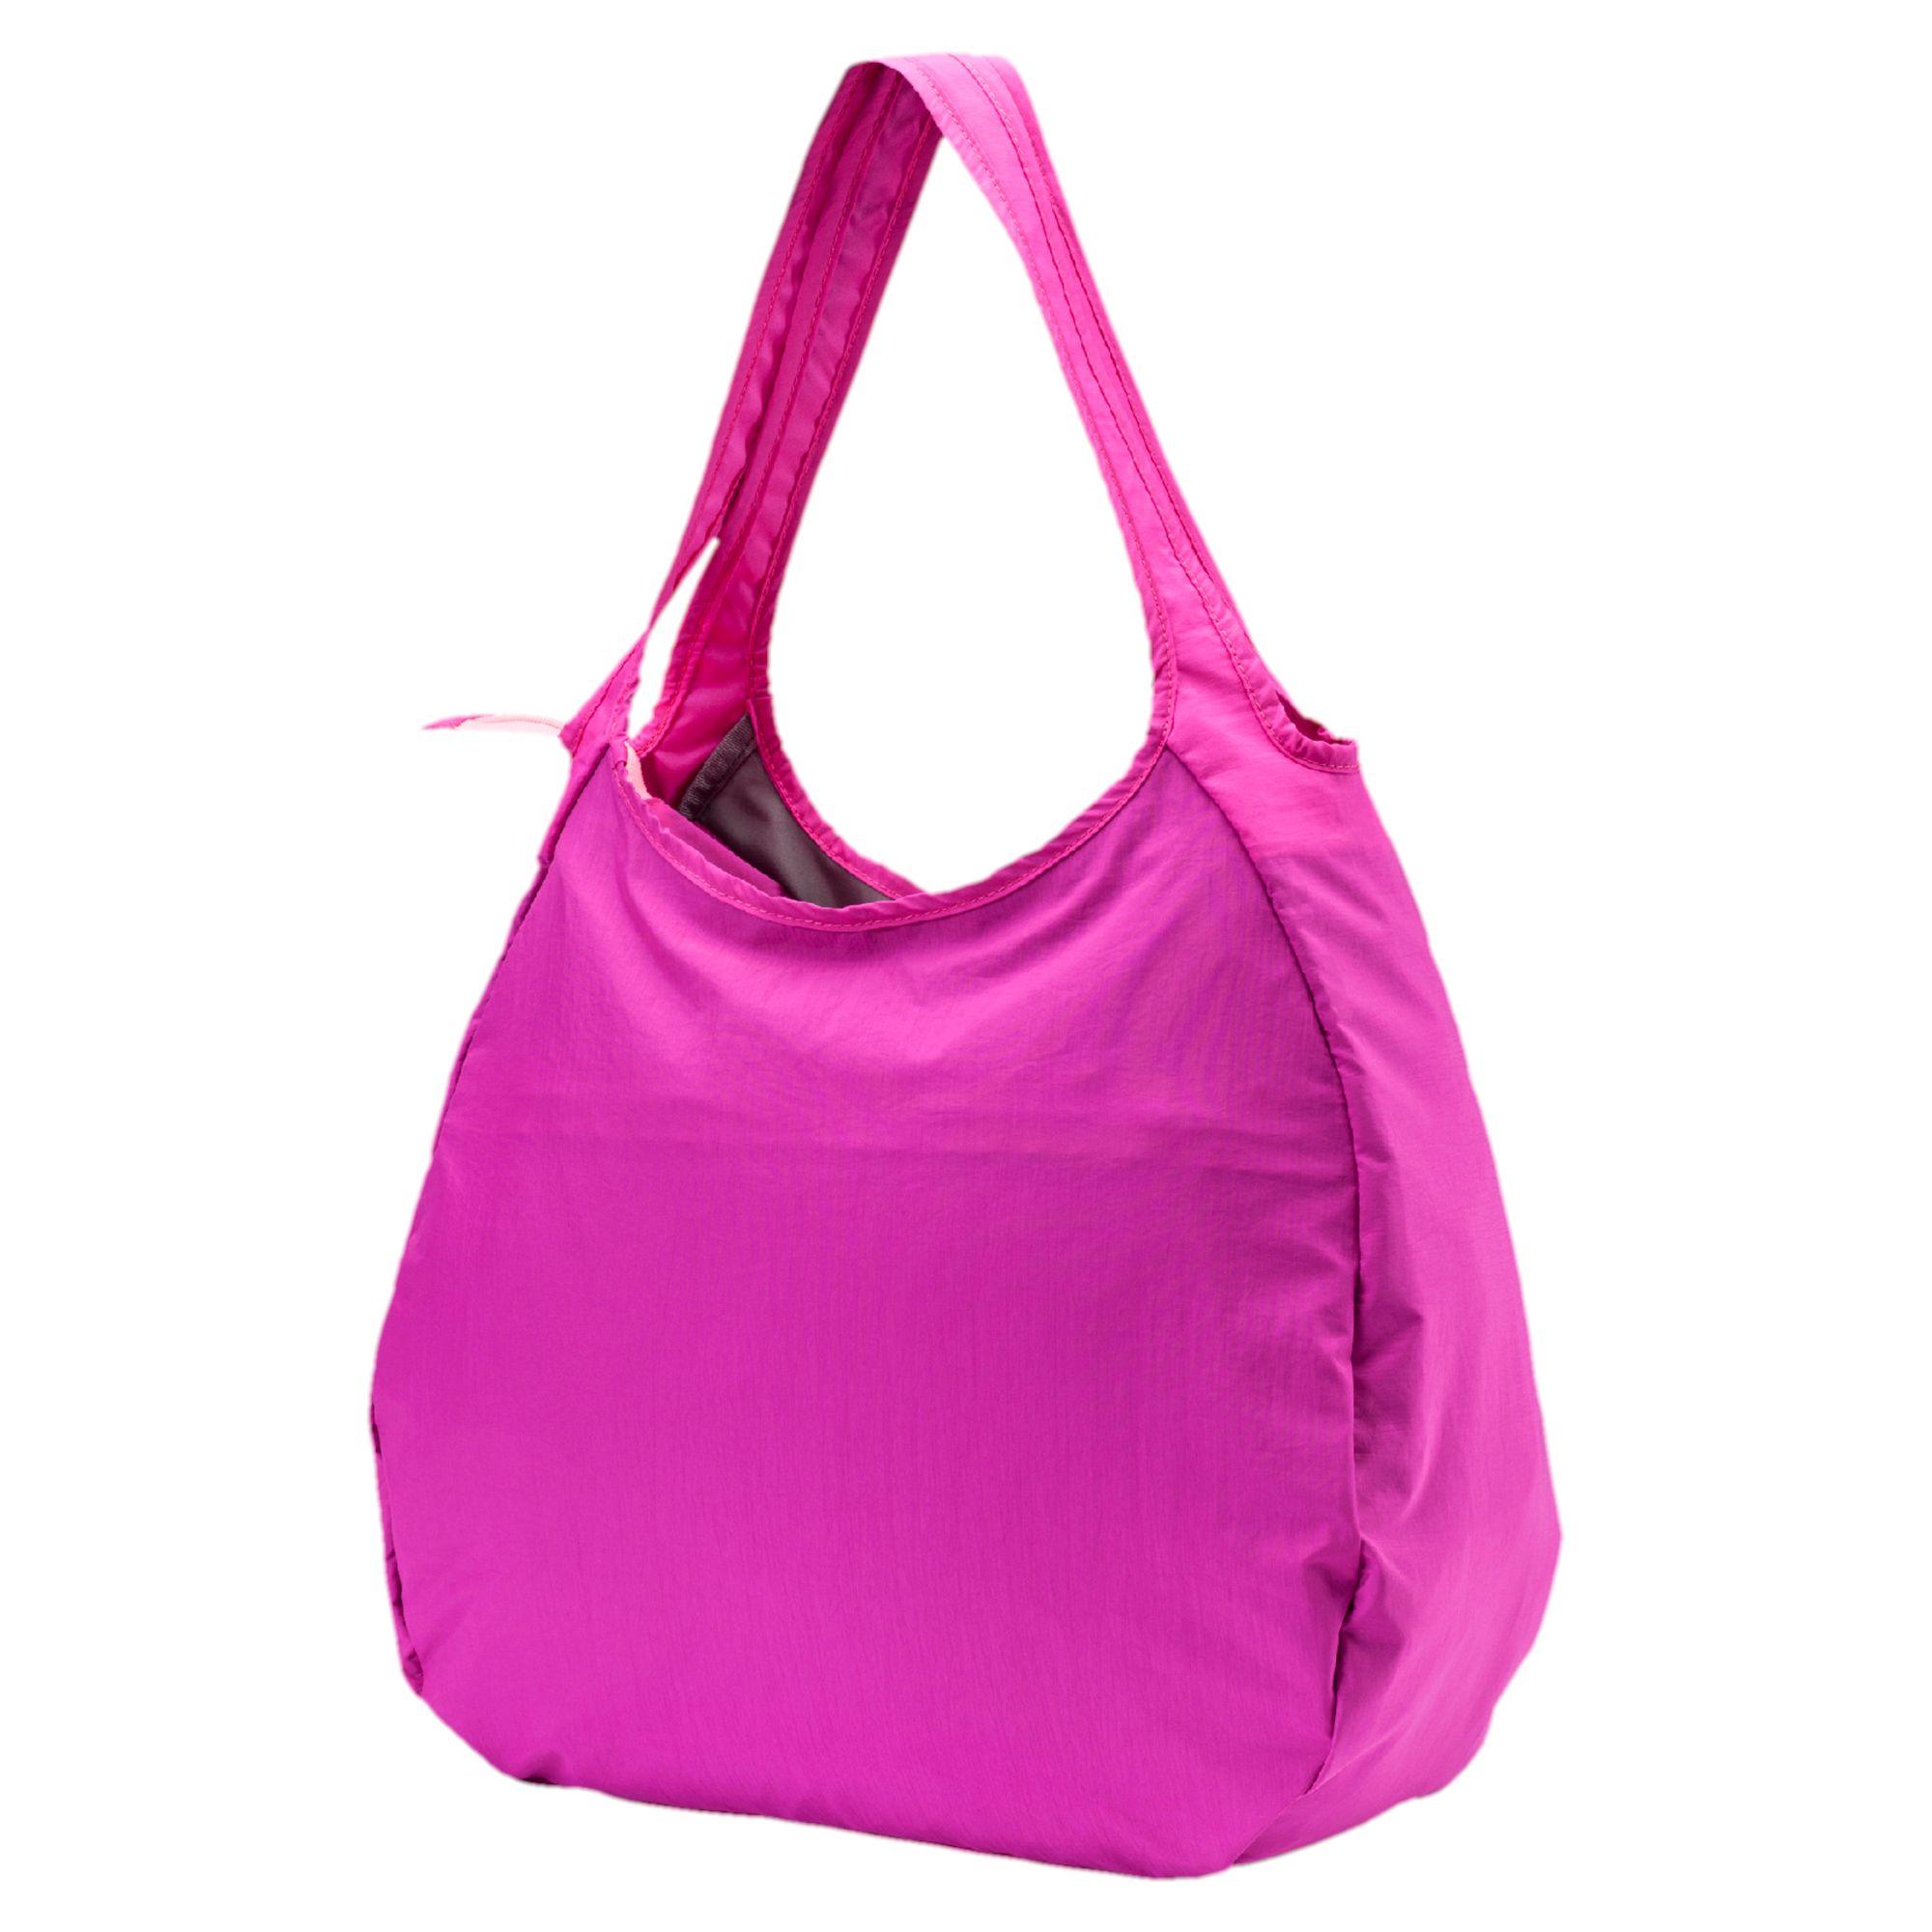 4244d052f0 PUMA Training Women s Studio Hobo Bag Training Shoulder Bags Female ...